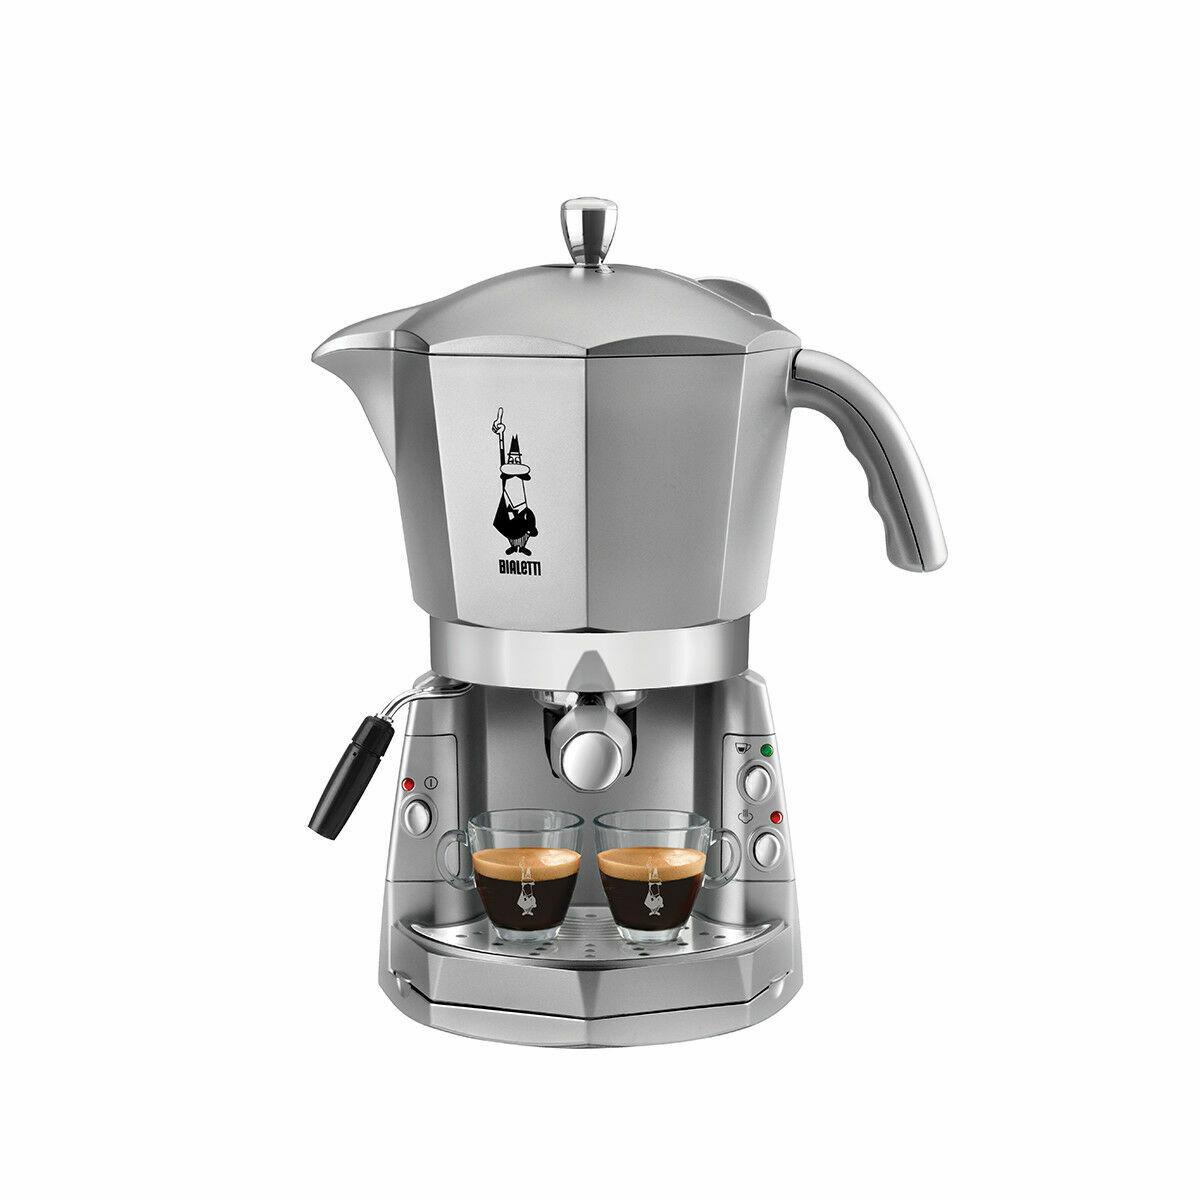 BIALETTI | CF40 Mokona Macchina da Caffè Trivalente Cialde Capsule o Macinato